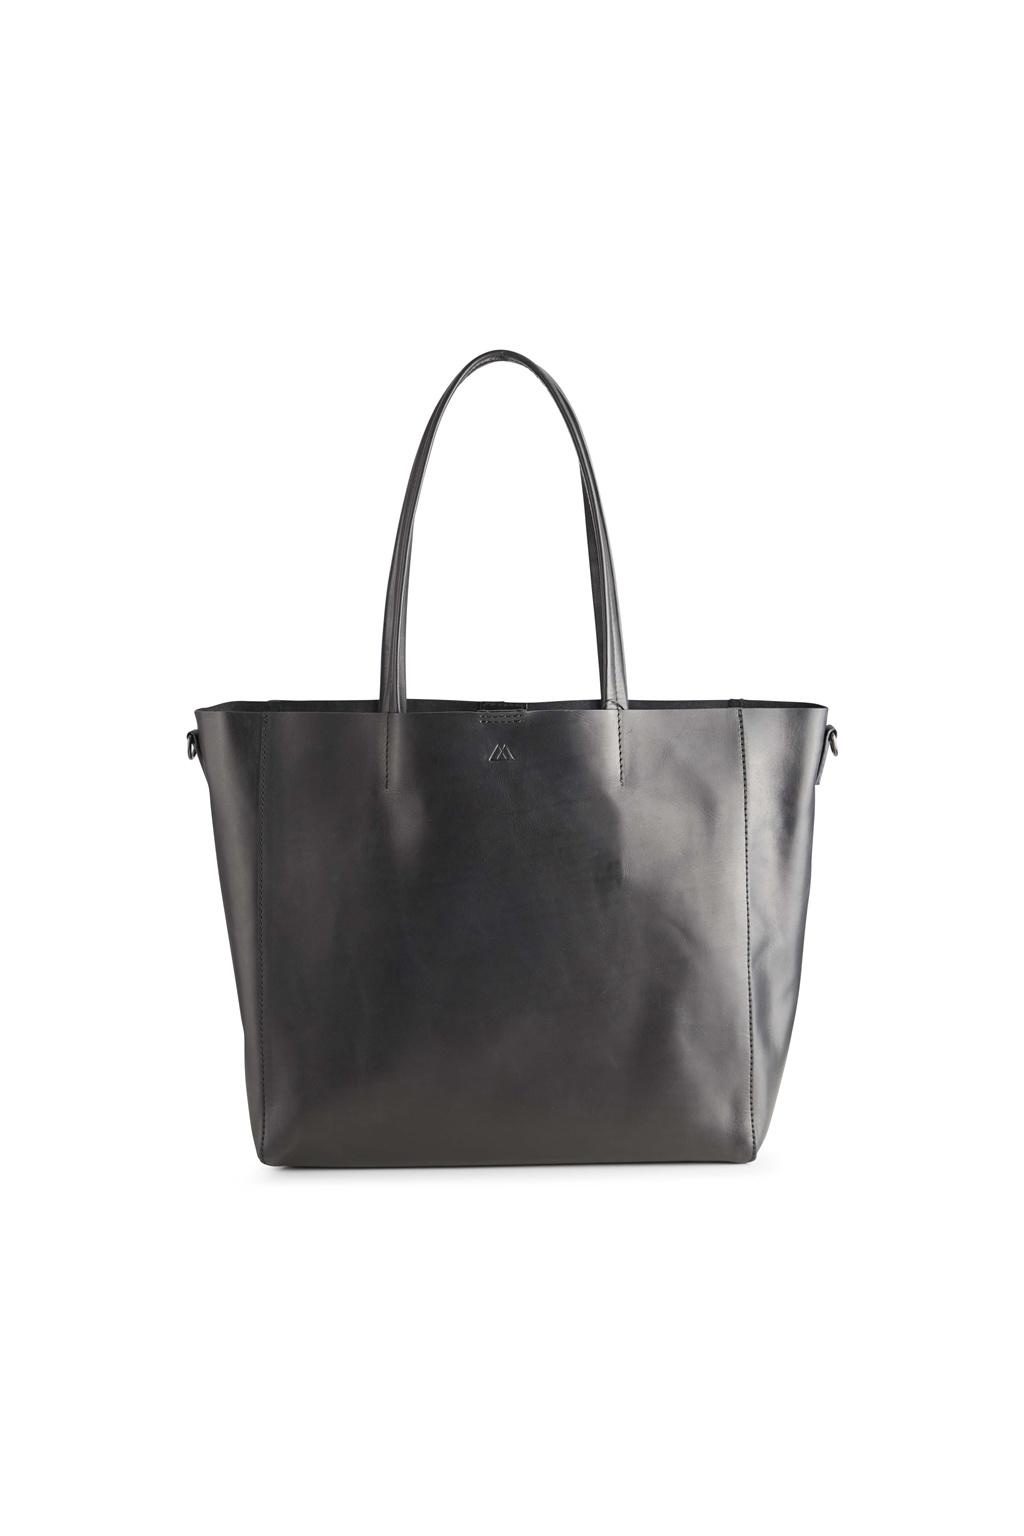 Reese Shopper Bag - Antique Black w/ Black-3